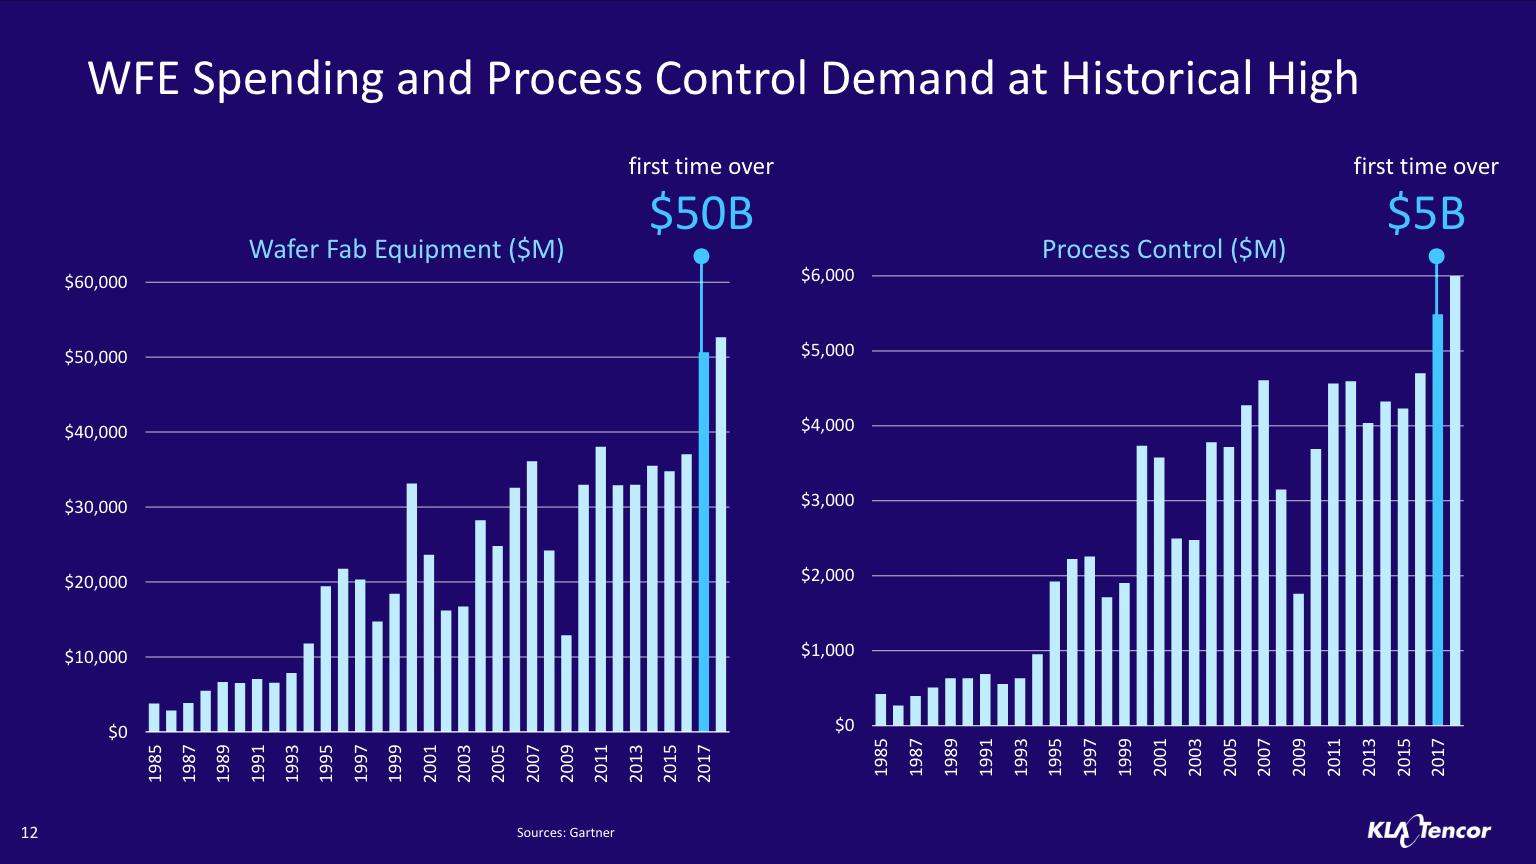 source: KLA-Tencor NASDAQ 39th Investor Conference presentation, Gartner;    click to enlarge